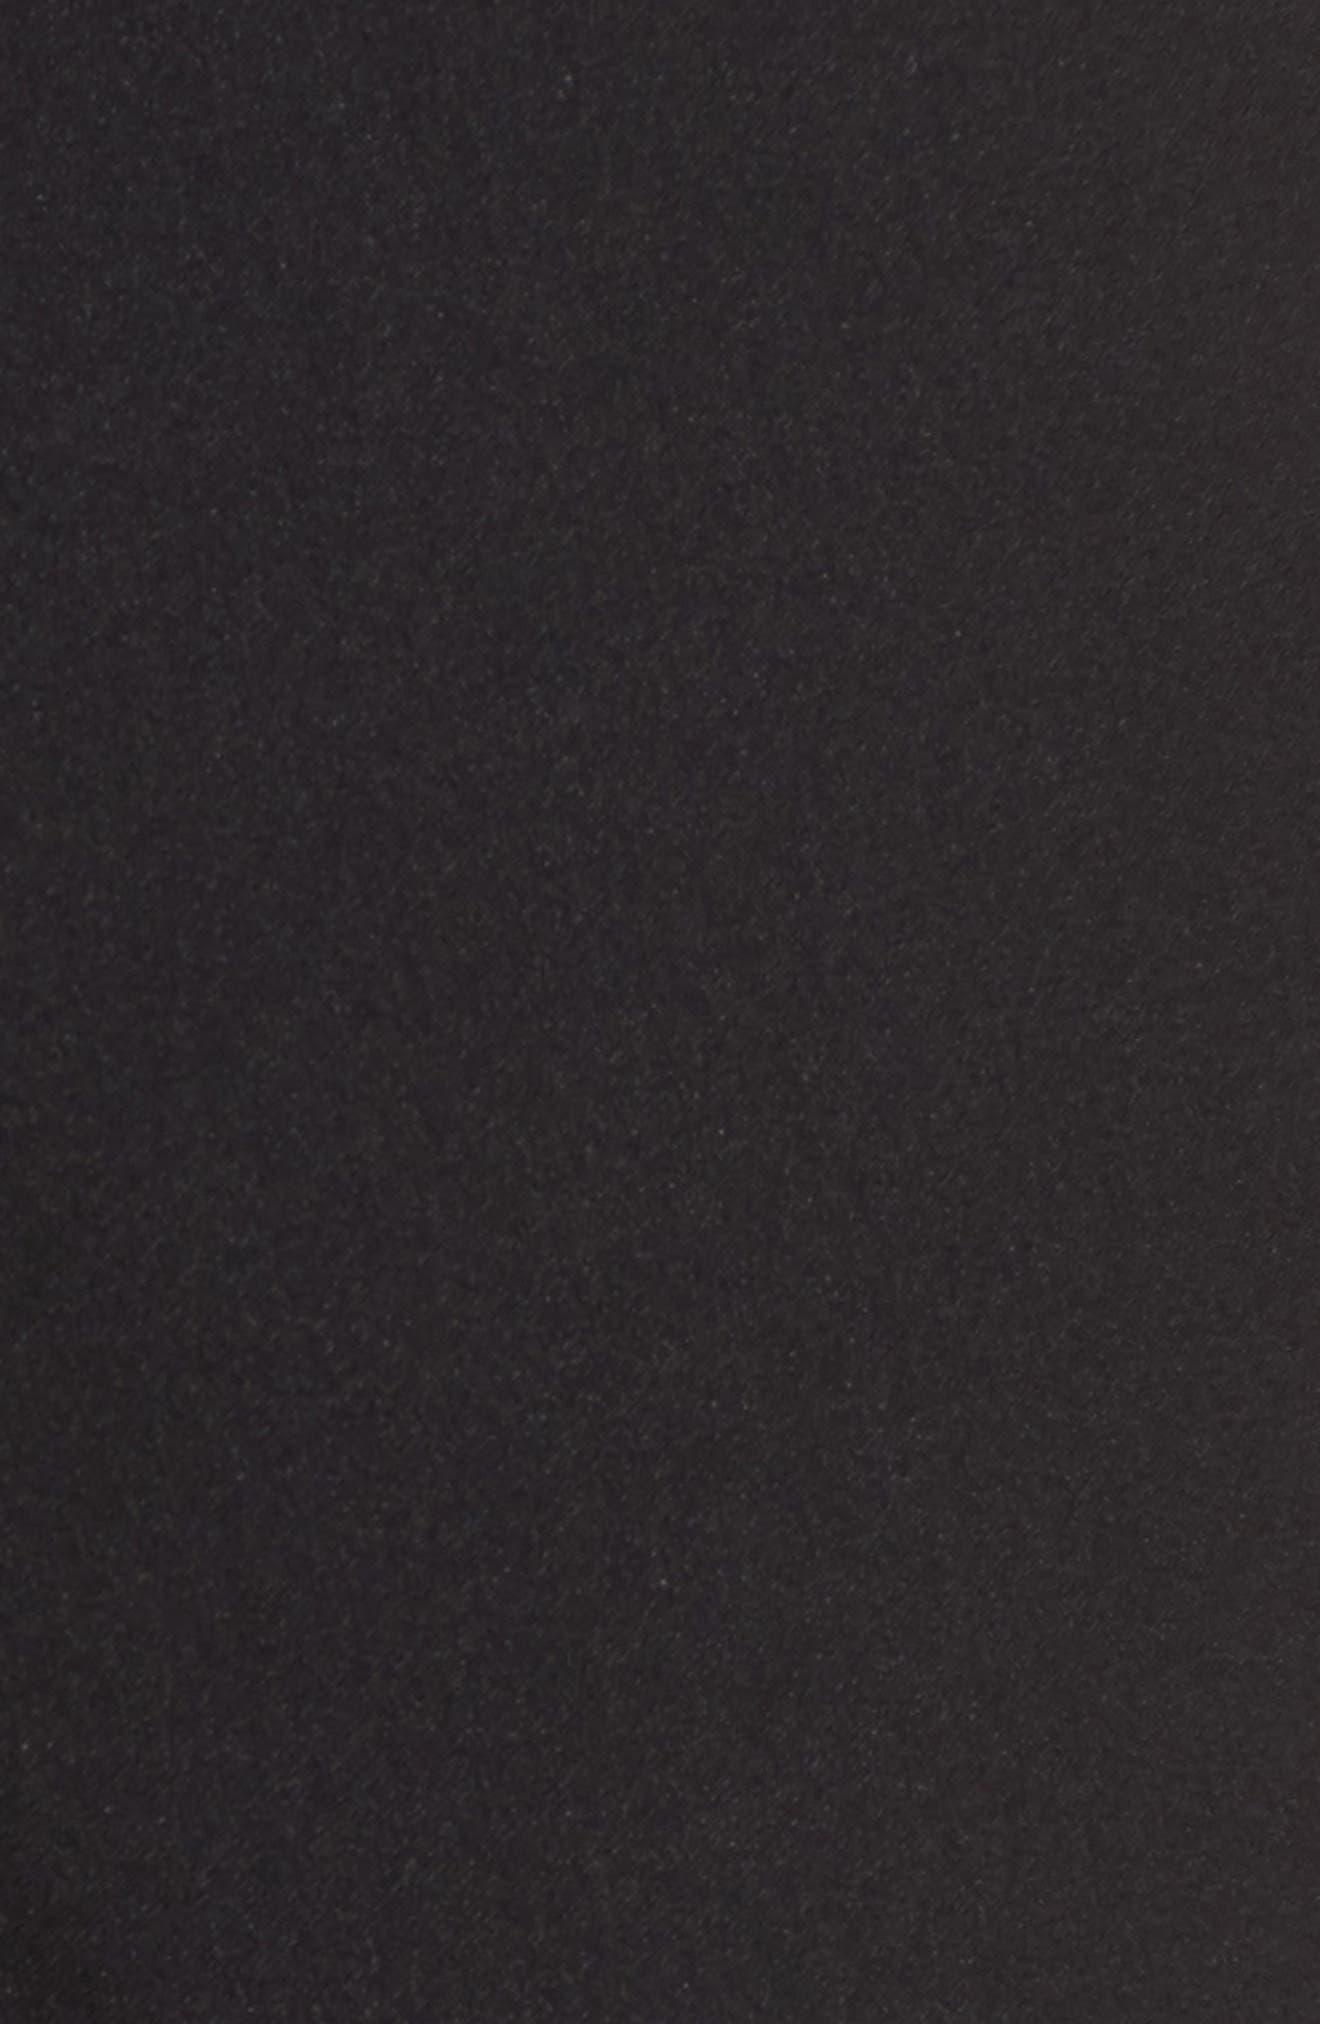 Wonder Stretch Crop Pants,                             Alternate thumbnail 5, color,                             BLACK ONYX